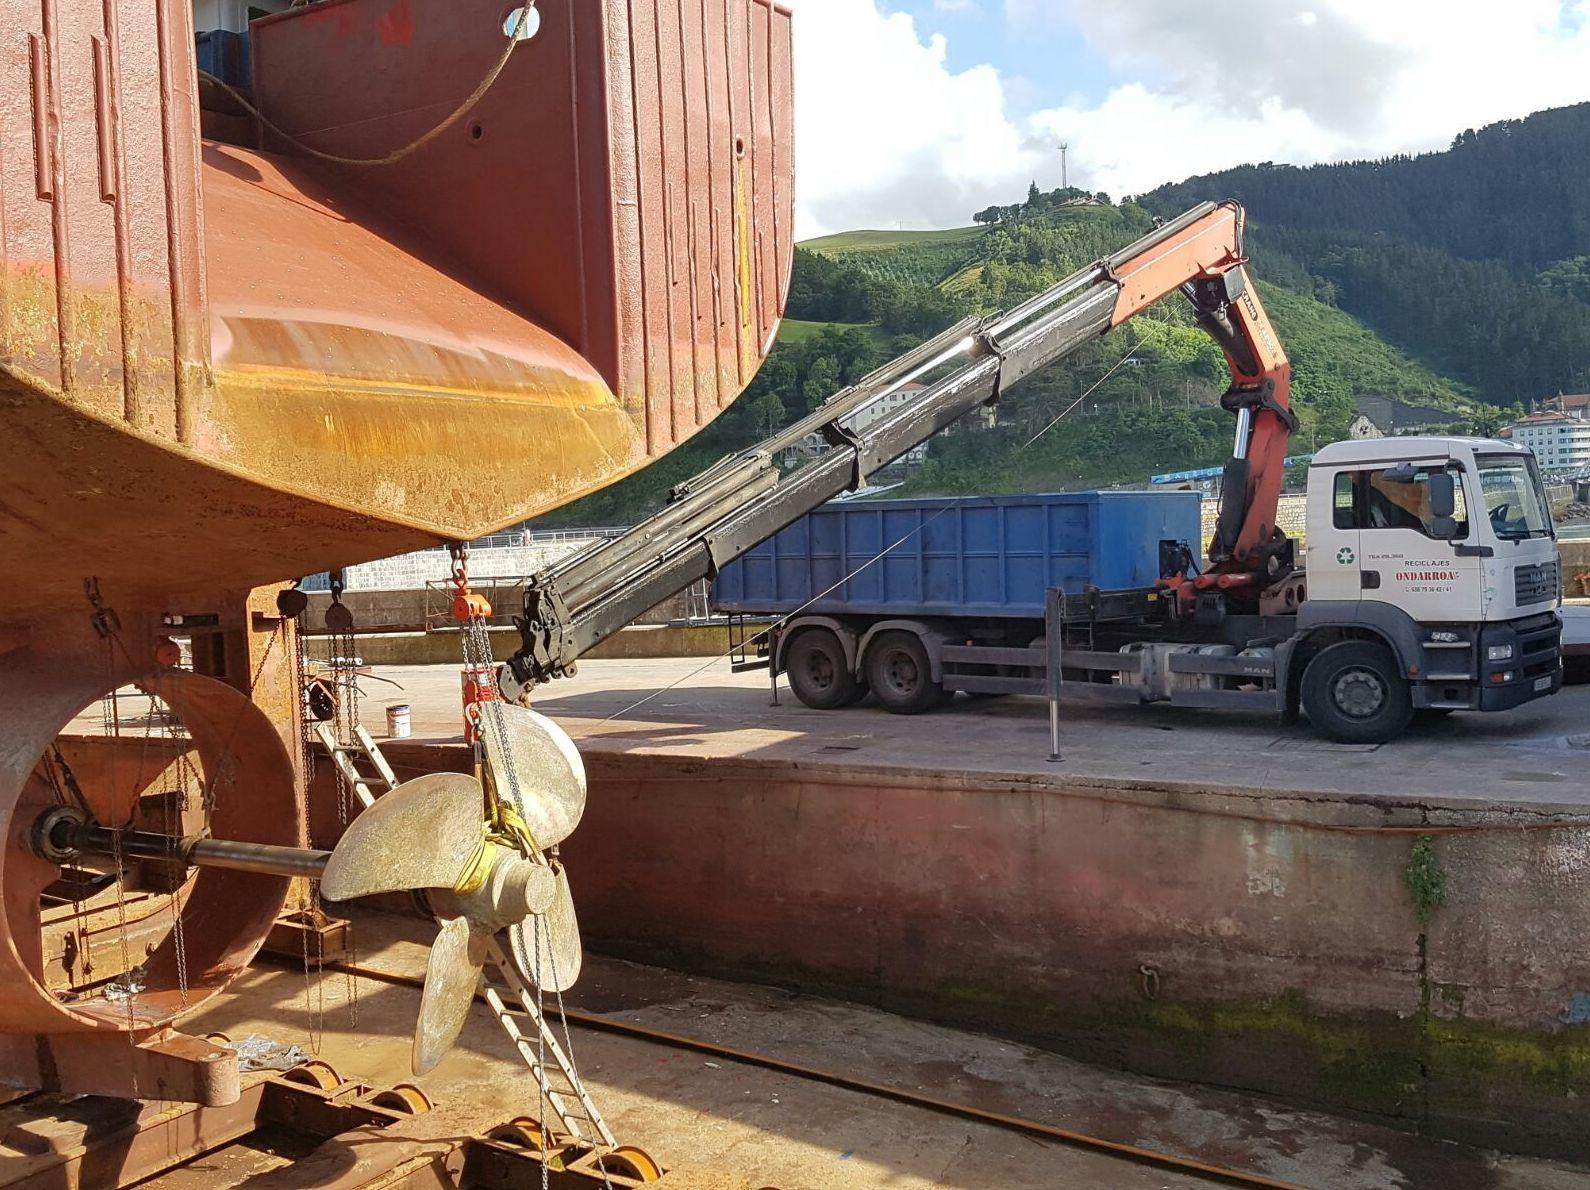 DESGUACE DE BARCOS: Servicios de Reciclajes Ondarroa